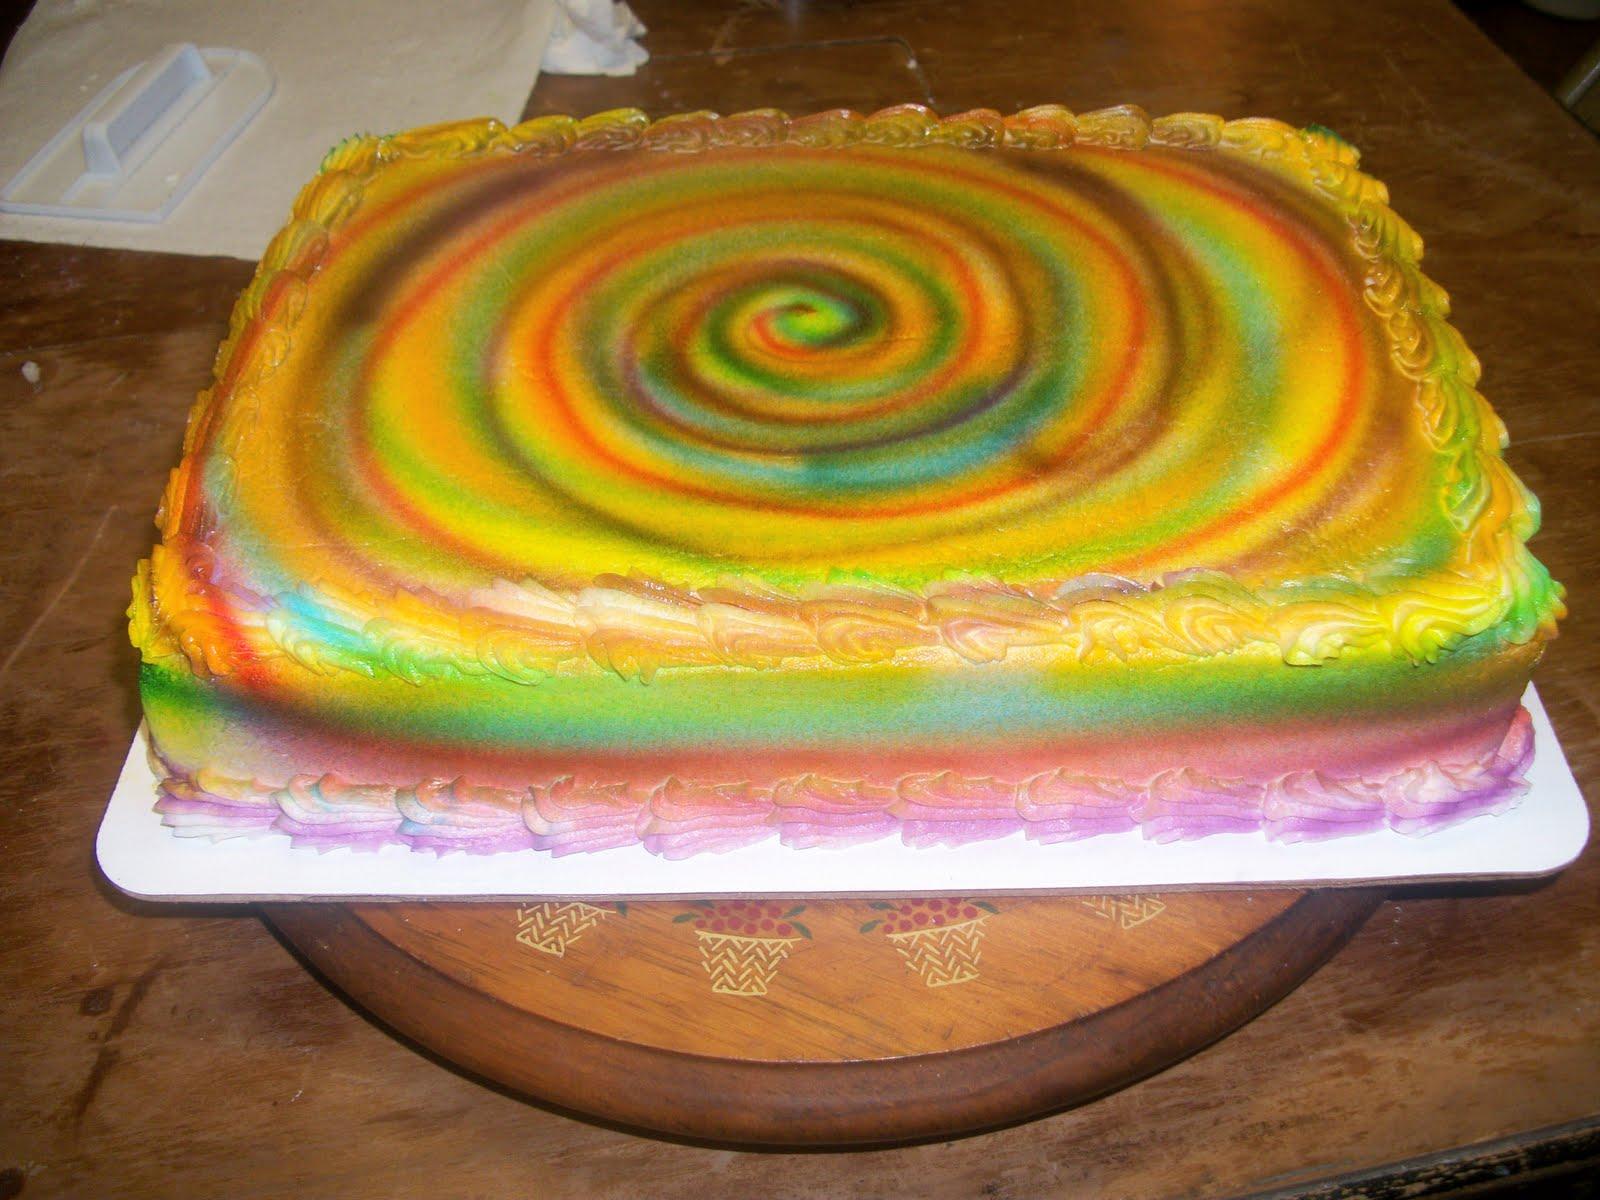 Tasty Cakes: 70s Tie Dye Cake